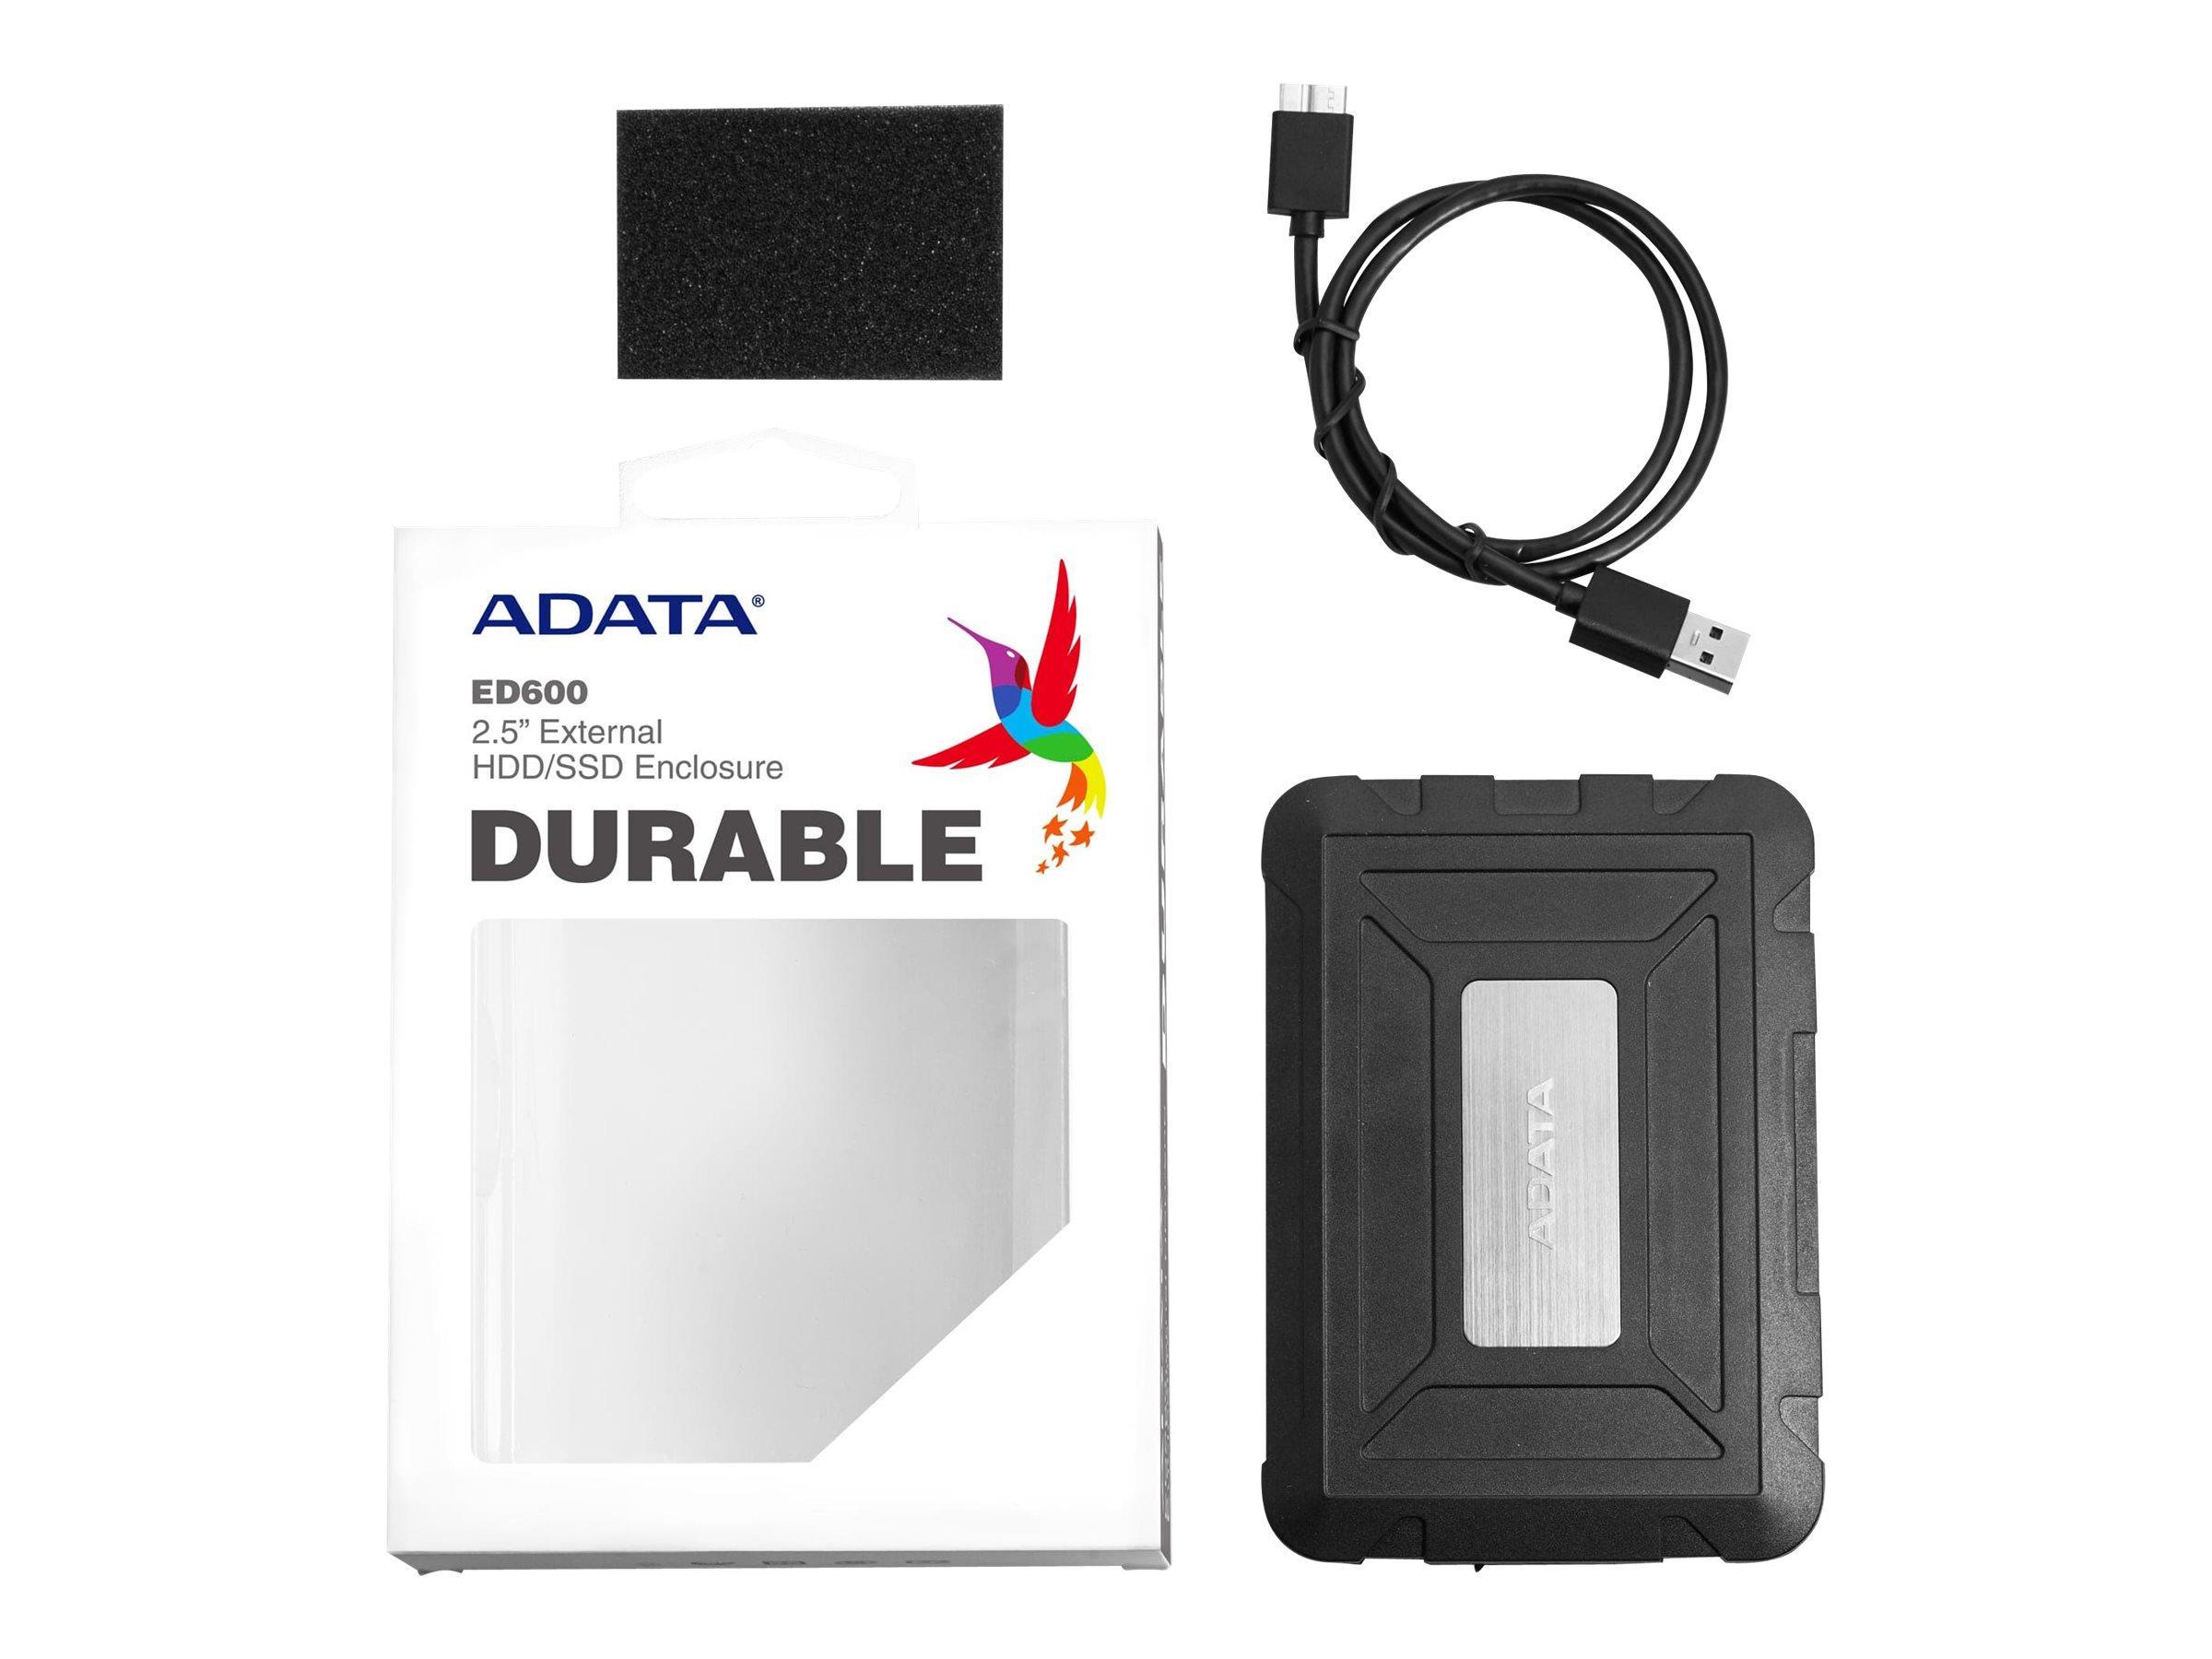 ADATA ED600 Durable HDD 2.5i enclosure